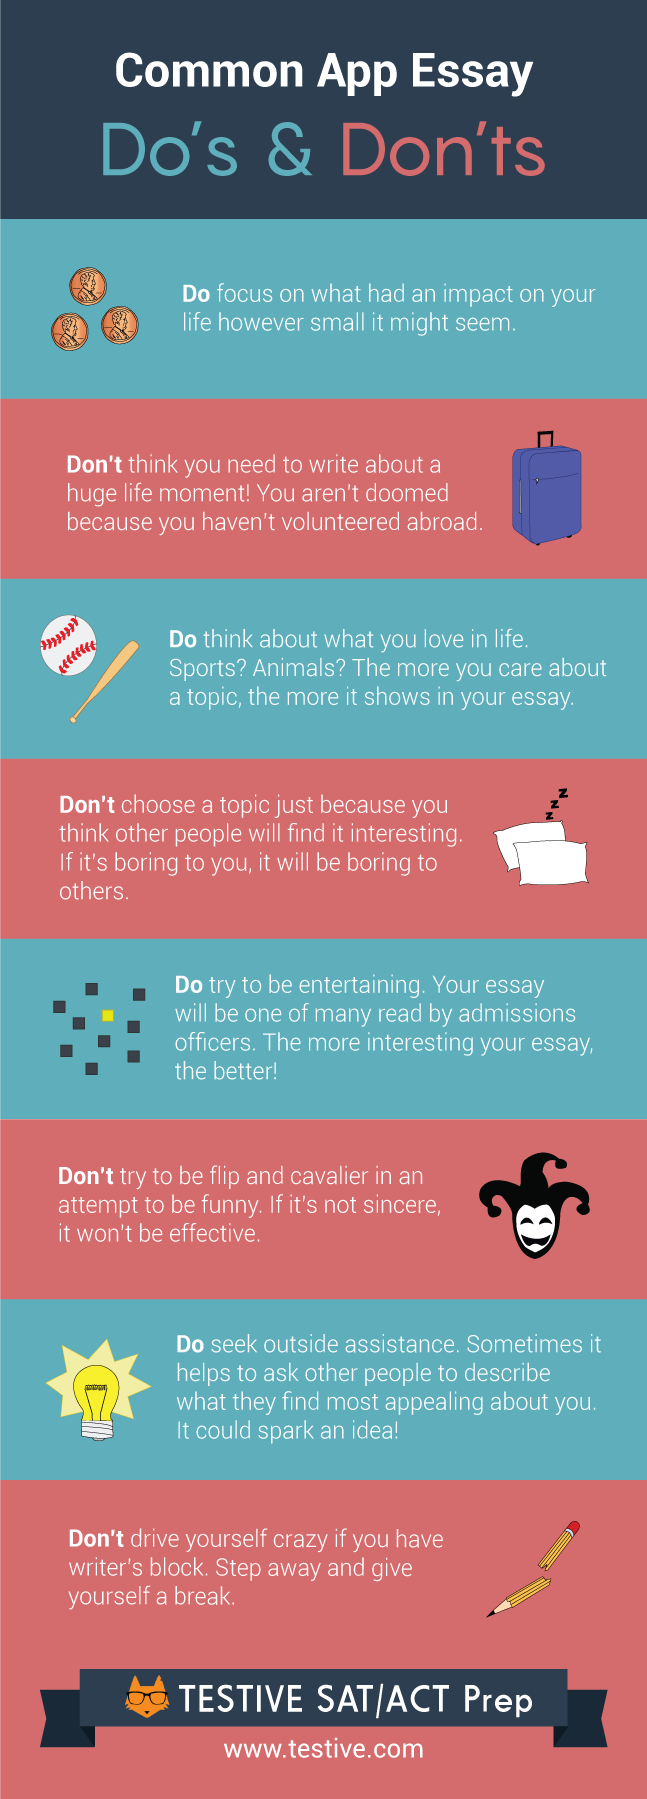 How To Write Common App Essay - arxiusarquitectura